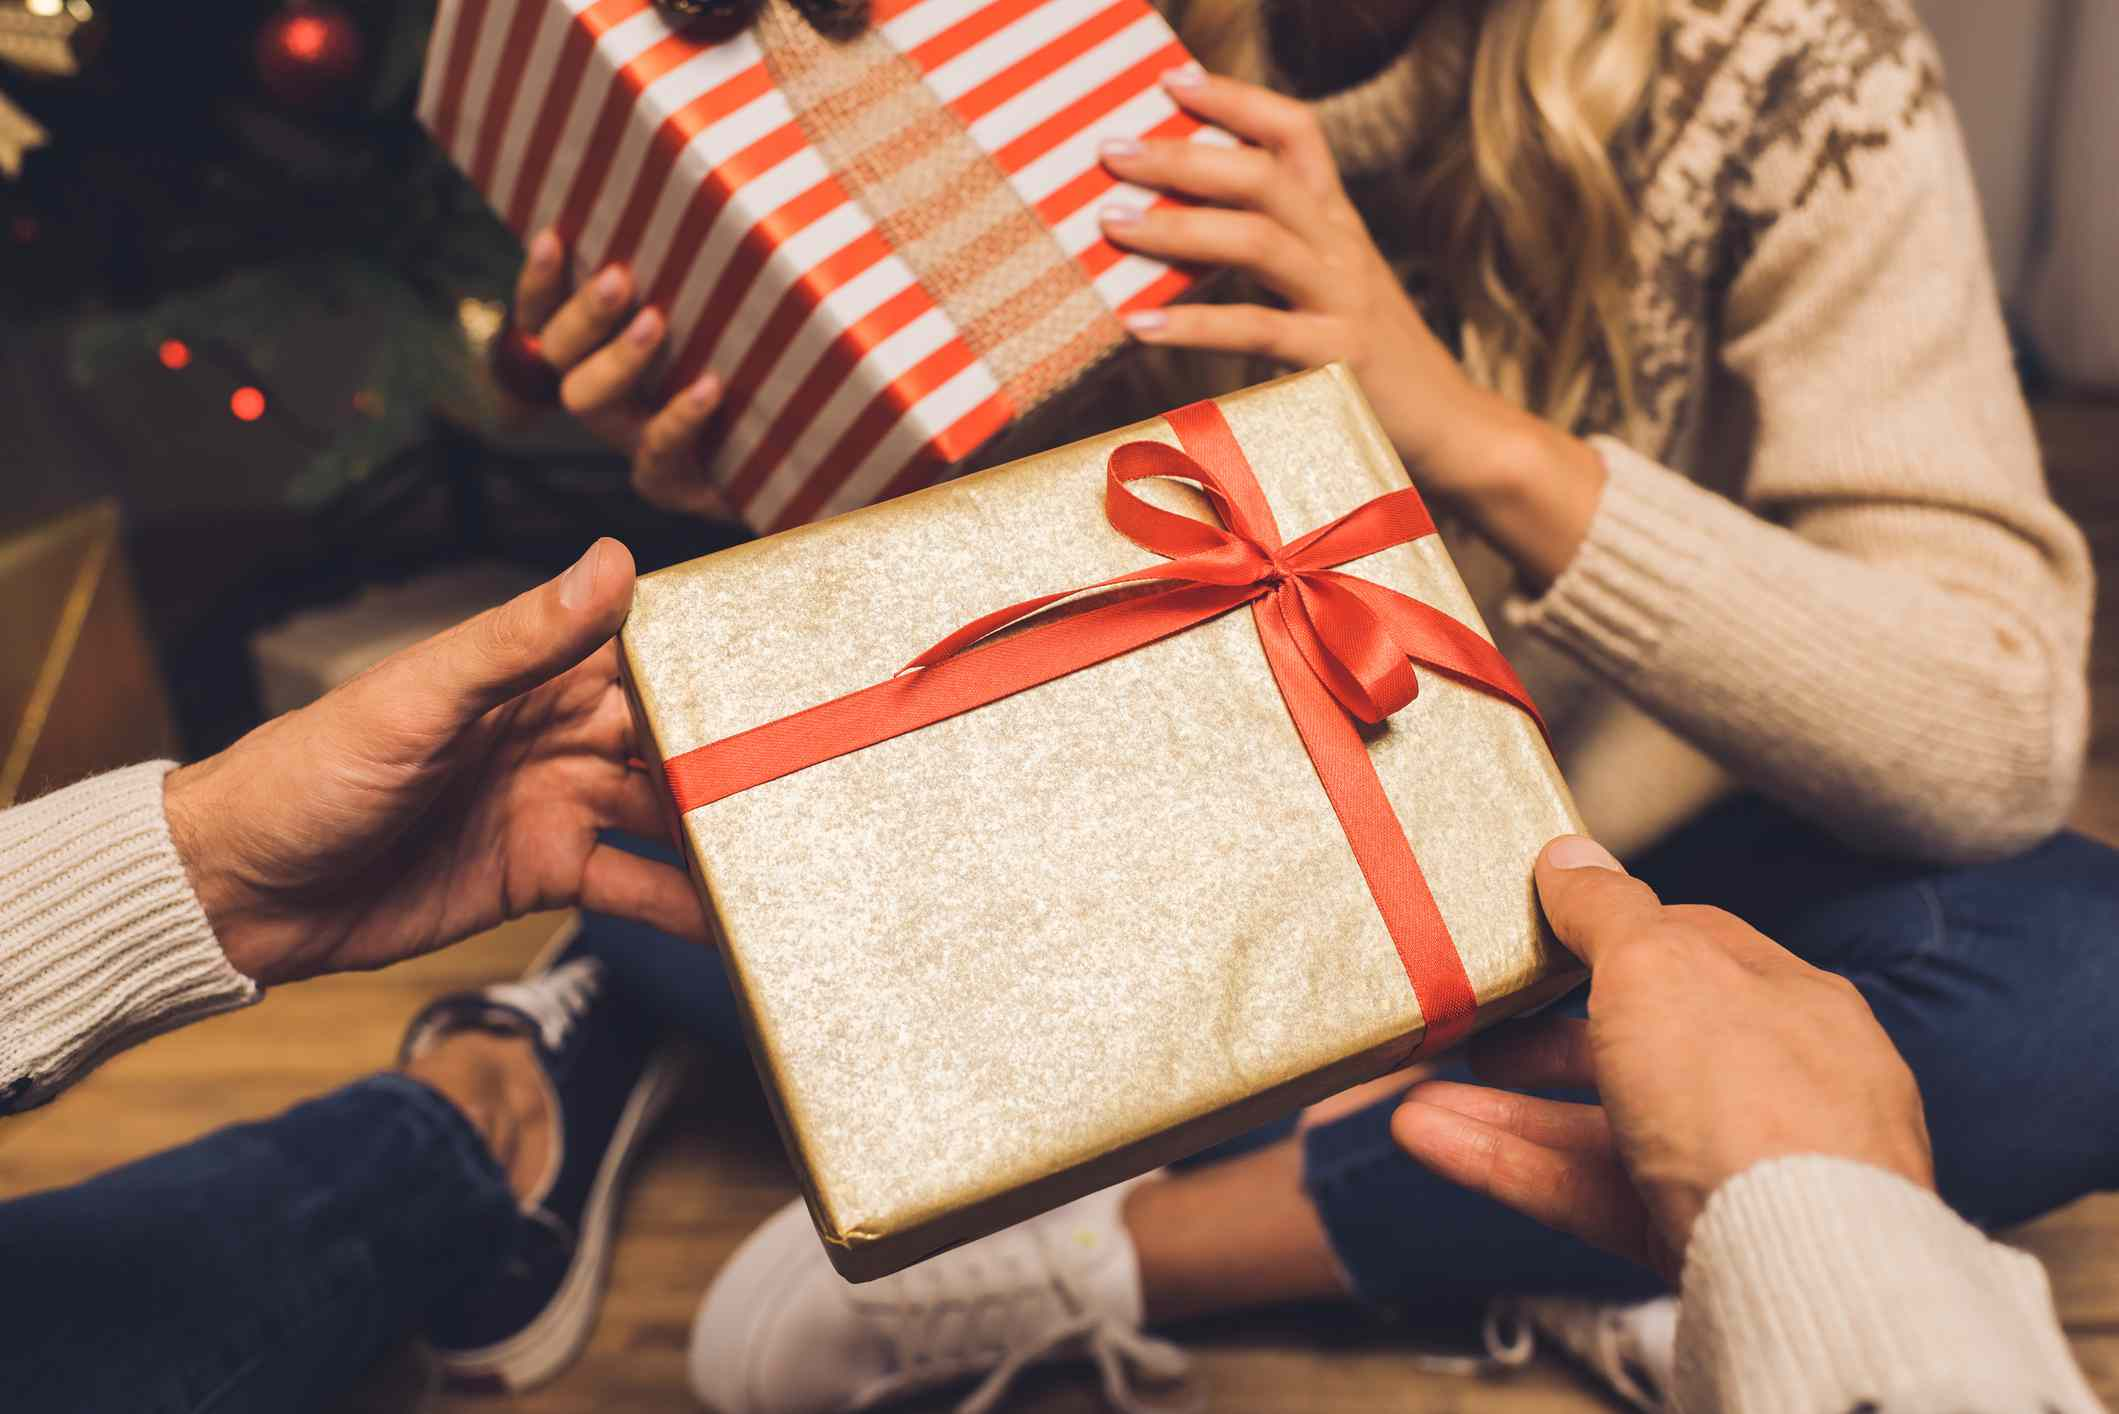 Hands exchange gifts